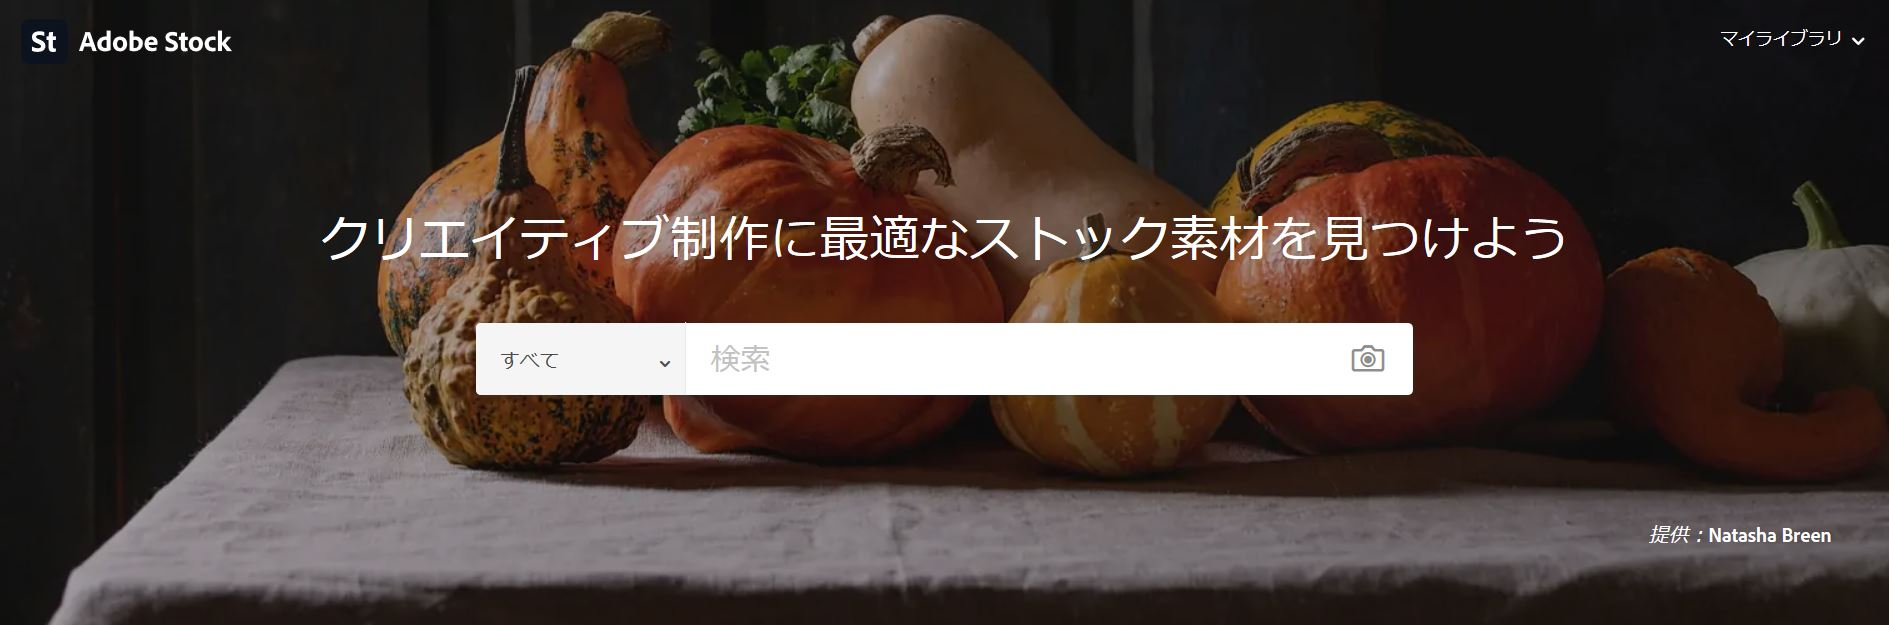 Adobe Stockの画像